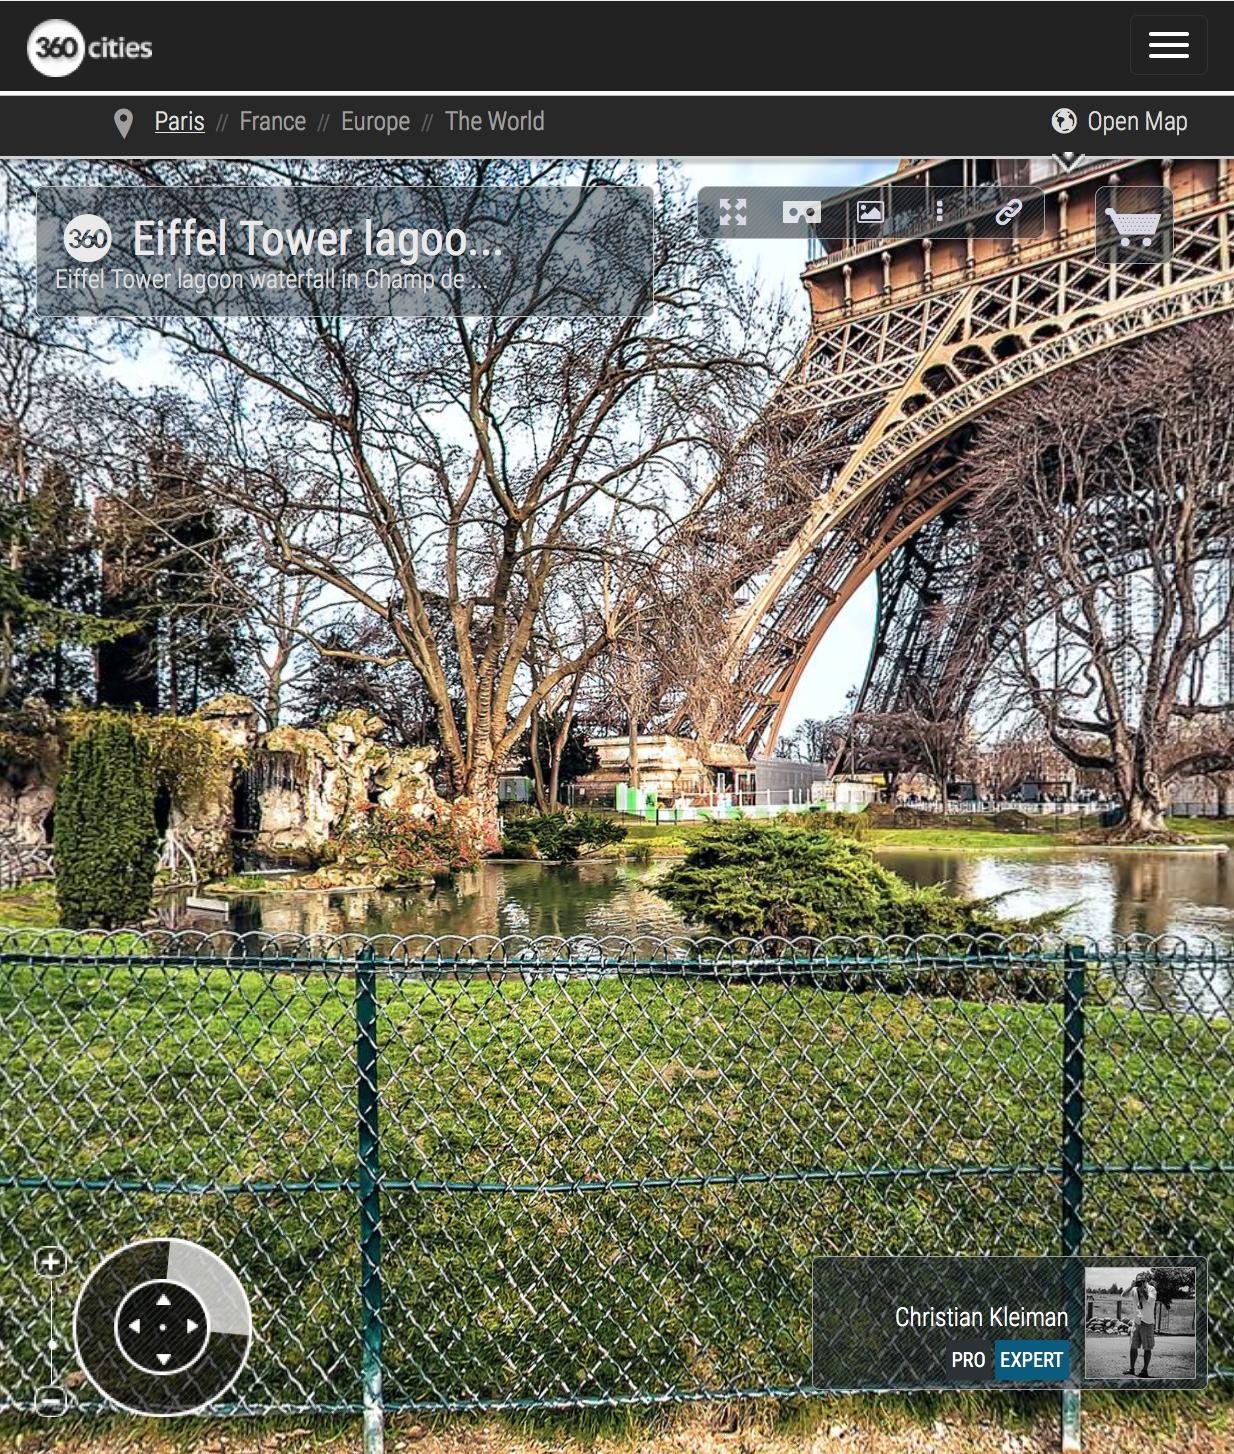 Lagoon waterfall - Eiffel Tower - Winter at Champ de Mars Garden - Creative 360 VR Spherical Panoramic Photography - Emblematic Paris by © Christian Kleiman